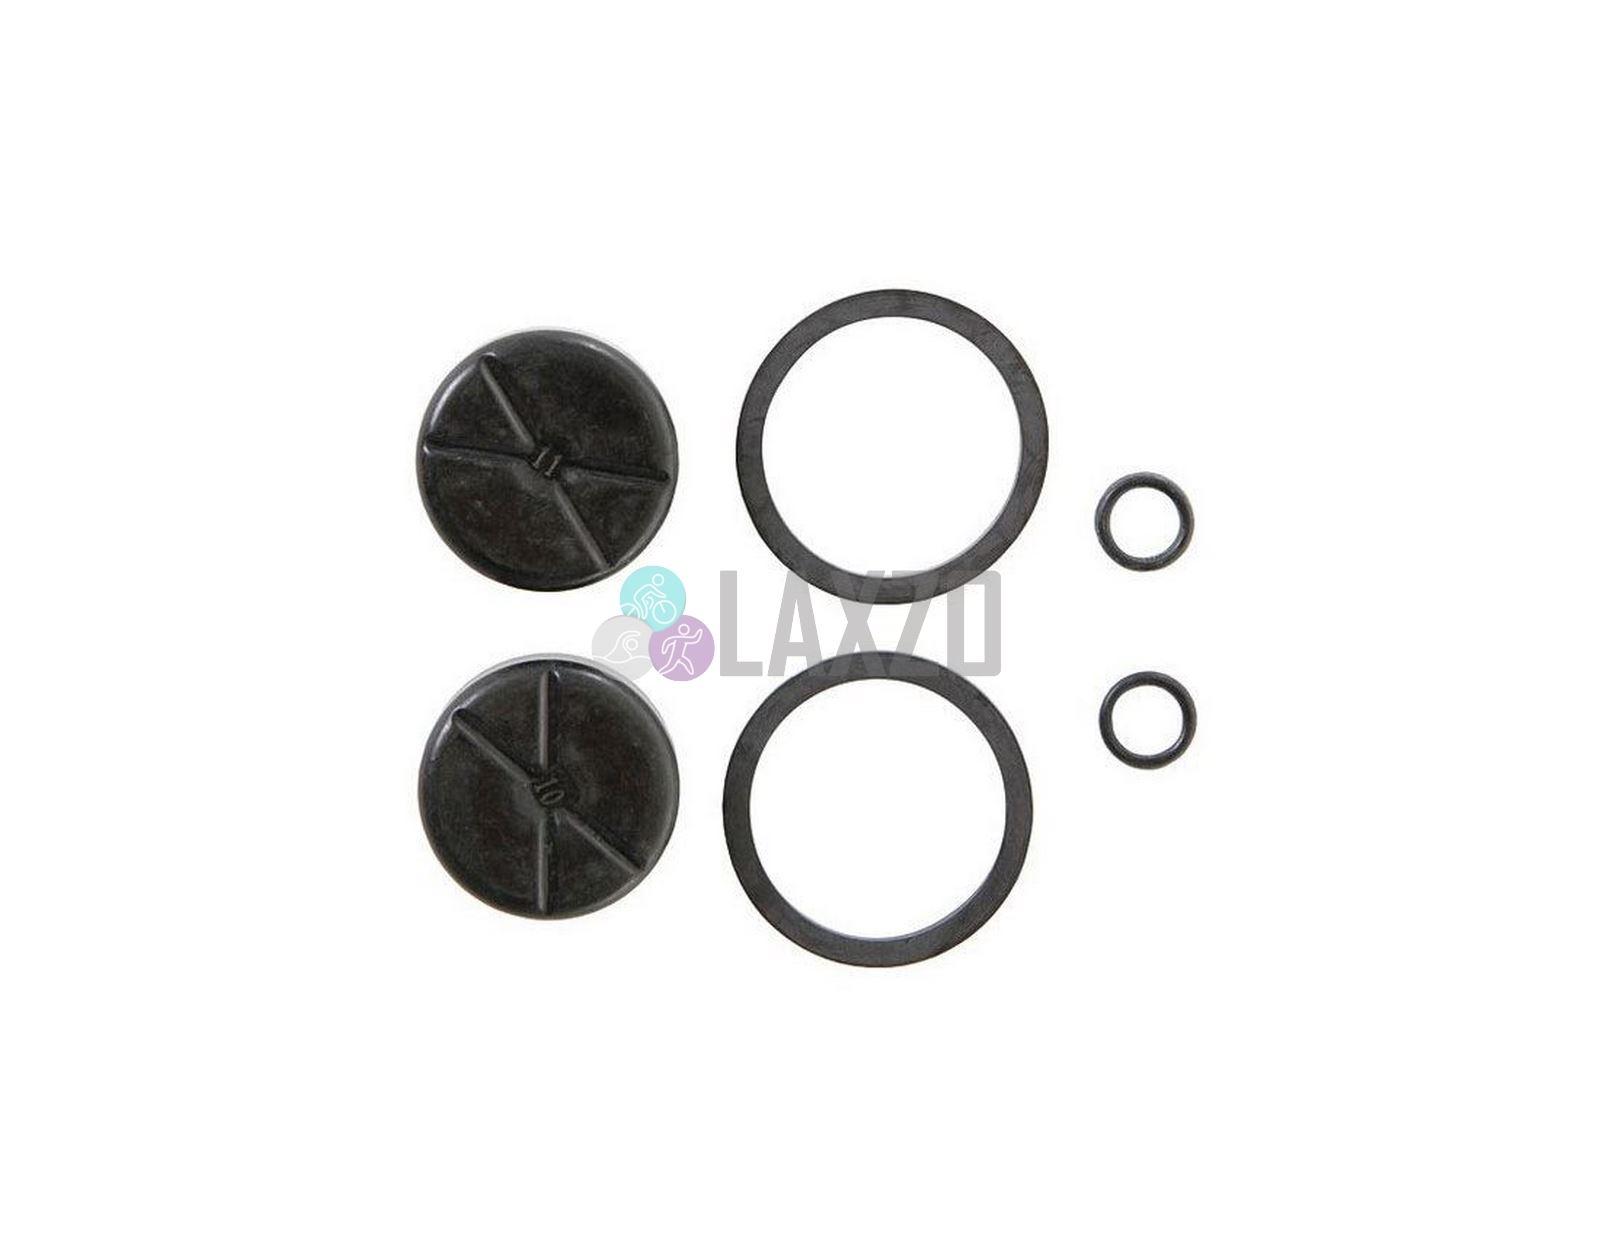 Avid Elixir Caliper Piston Kit 11.5015.032.000 schwarz Fahrrad